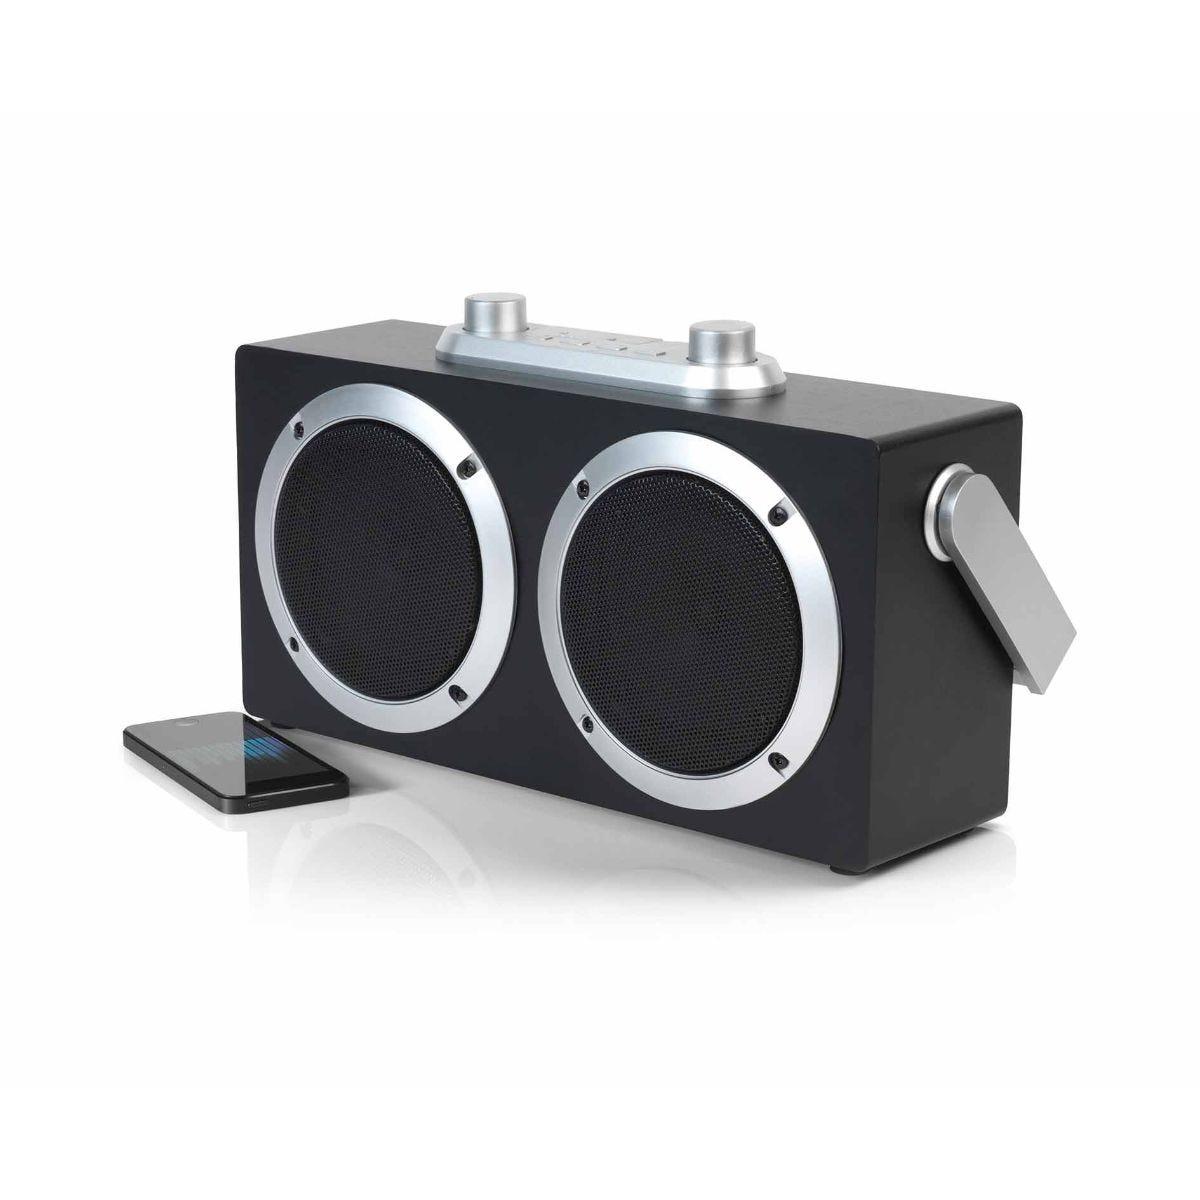 Image of Intempo Retro Blaster Wireless Bluetooth Speaker, Silver